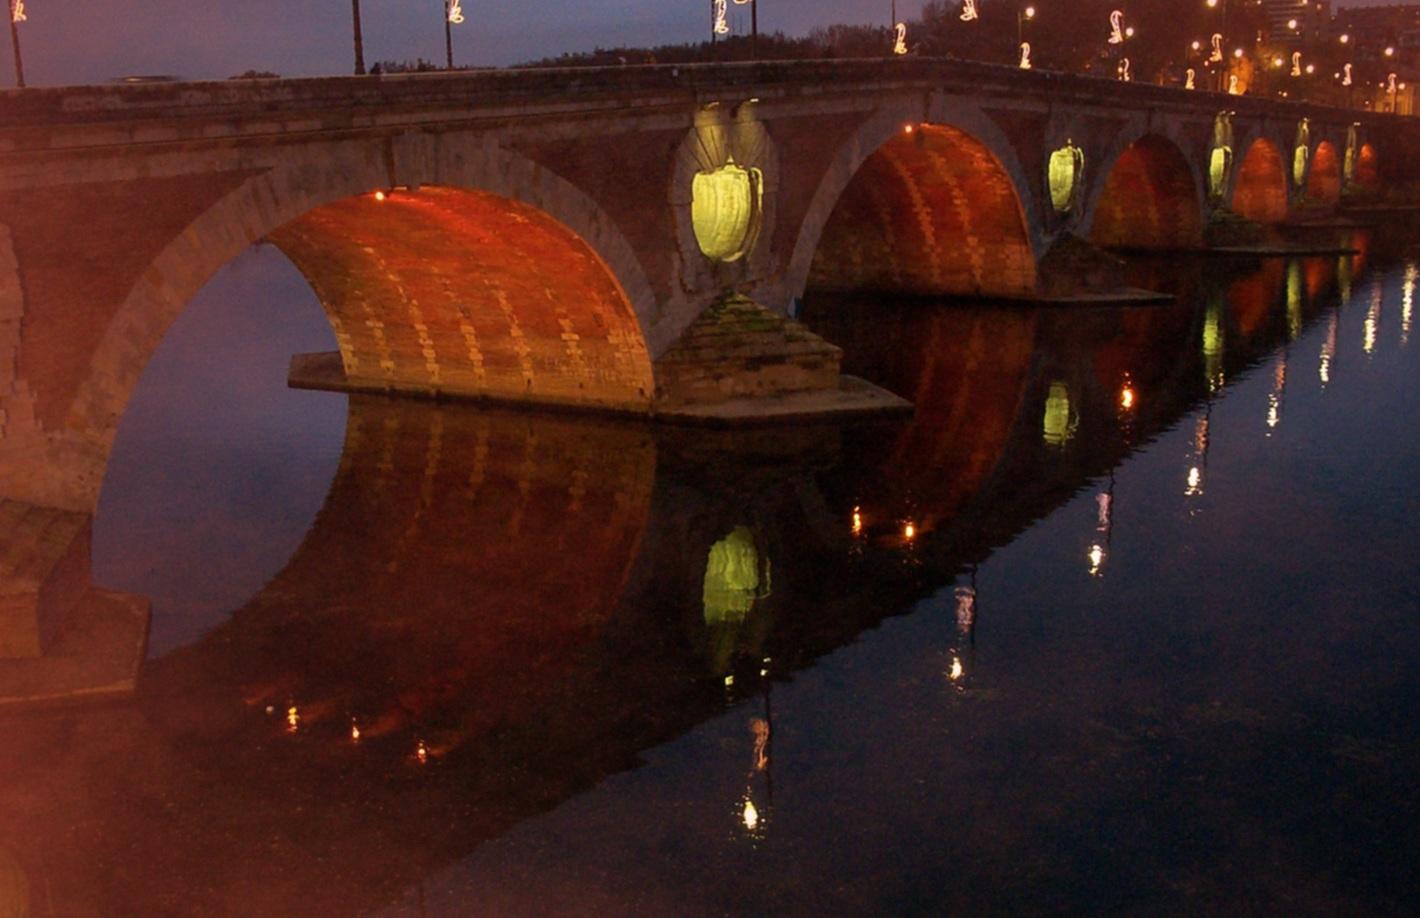 http://la.buvette.org/photos/pont_neuf_a_noel.jpg